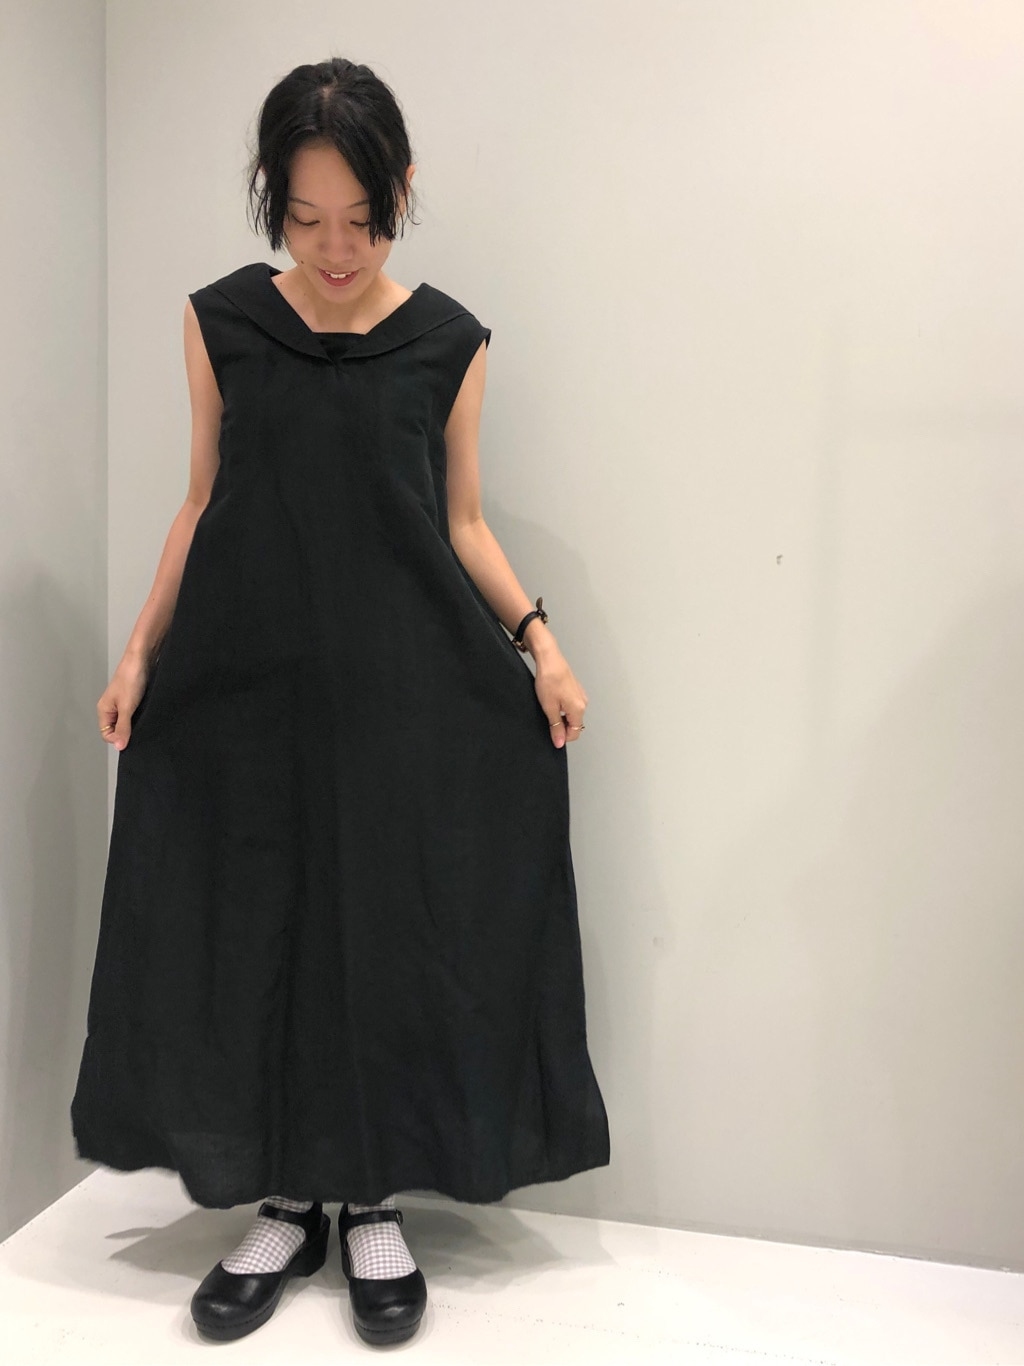 bulle de savon なんばシティ 身長:148cm 2020.08.20